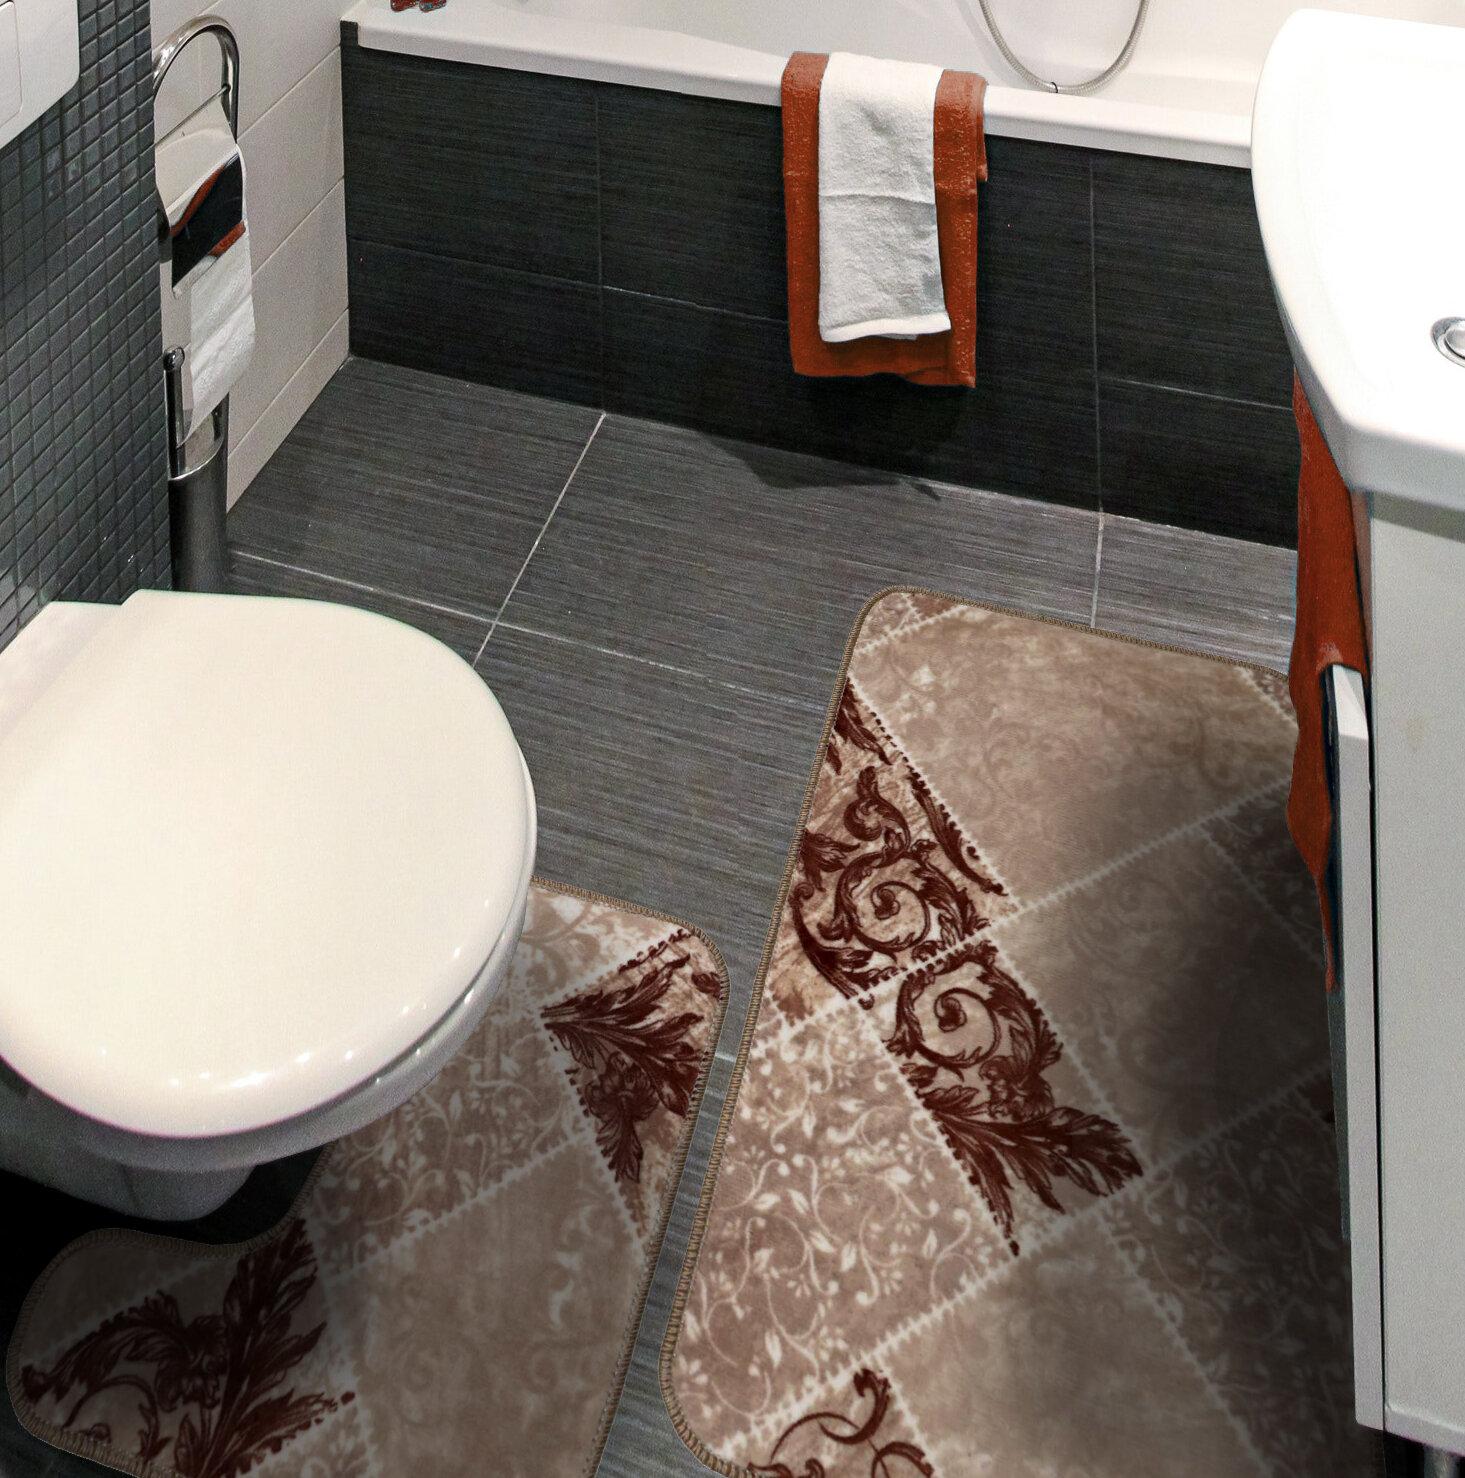 Bath Mat Set Non Slip Rubber 2 Piece Pedestal Bathroom Rug Fish Print Luxury New